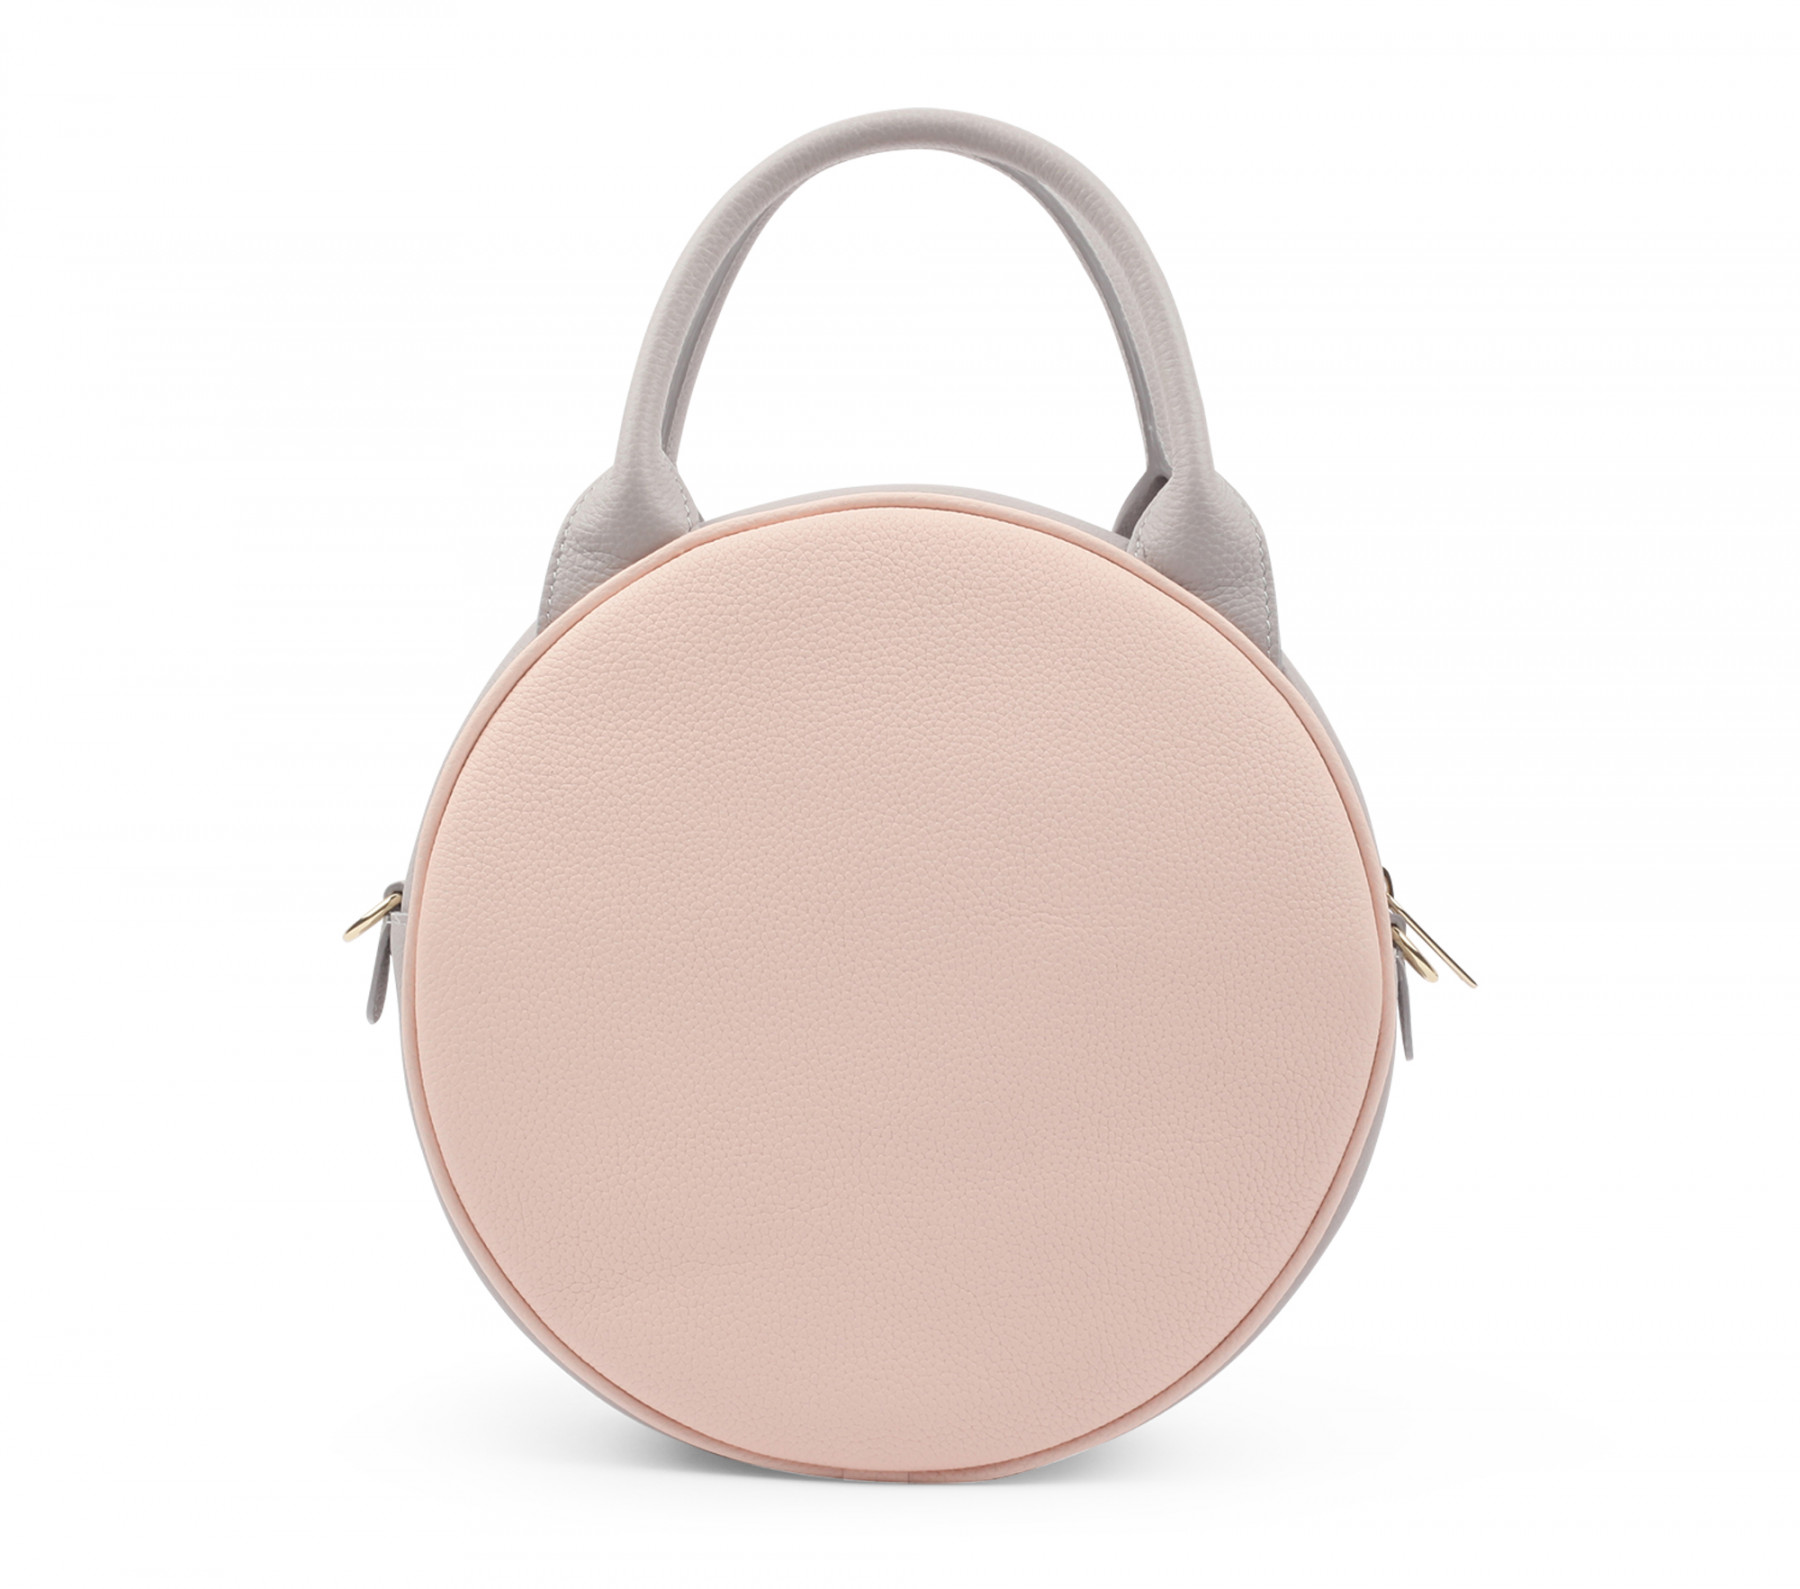 Couronne bag Large size